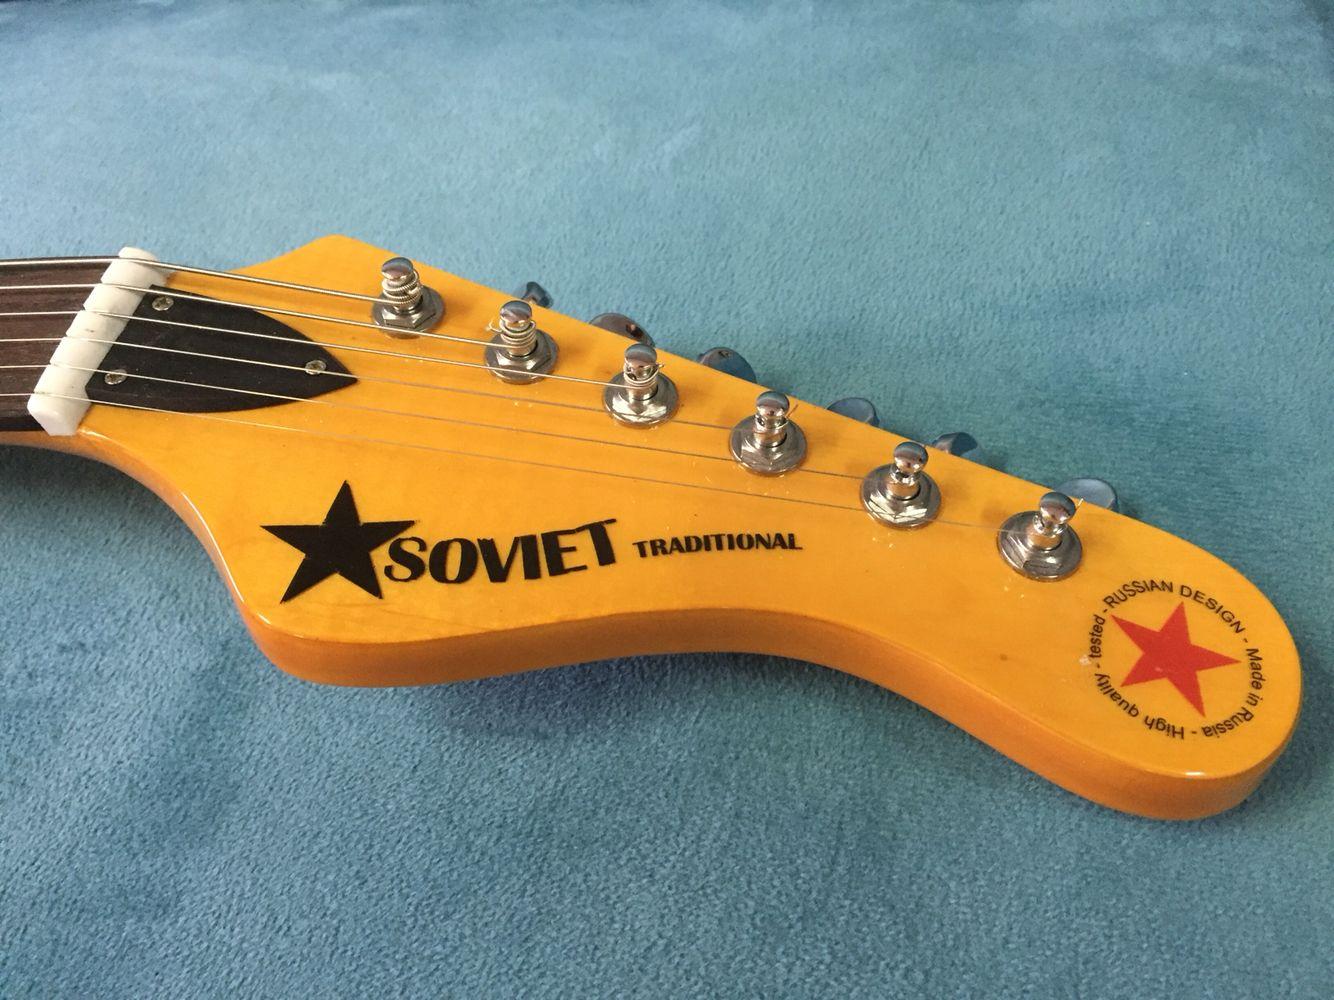 #SovietCustomShop #MelinaCardenes #GuitarrasSoviet